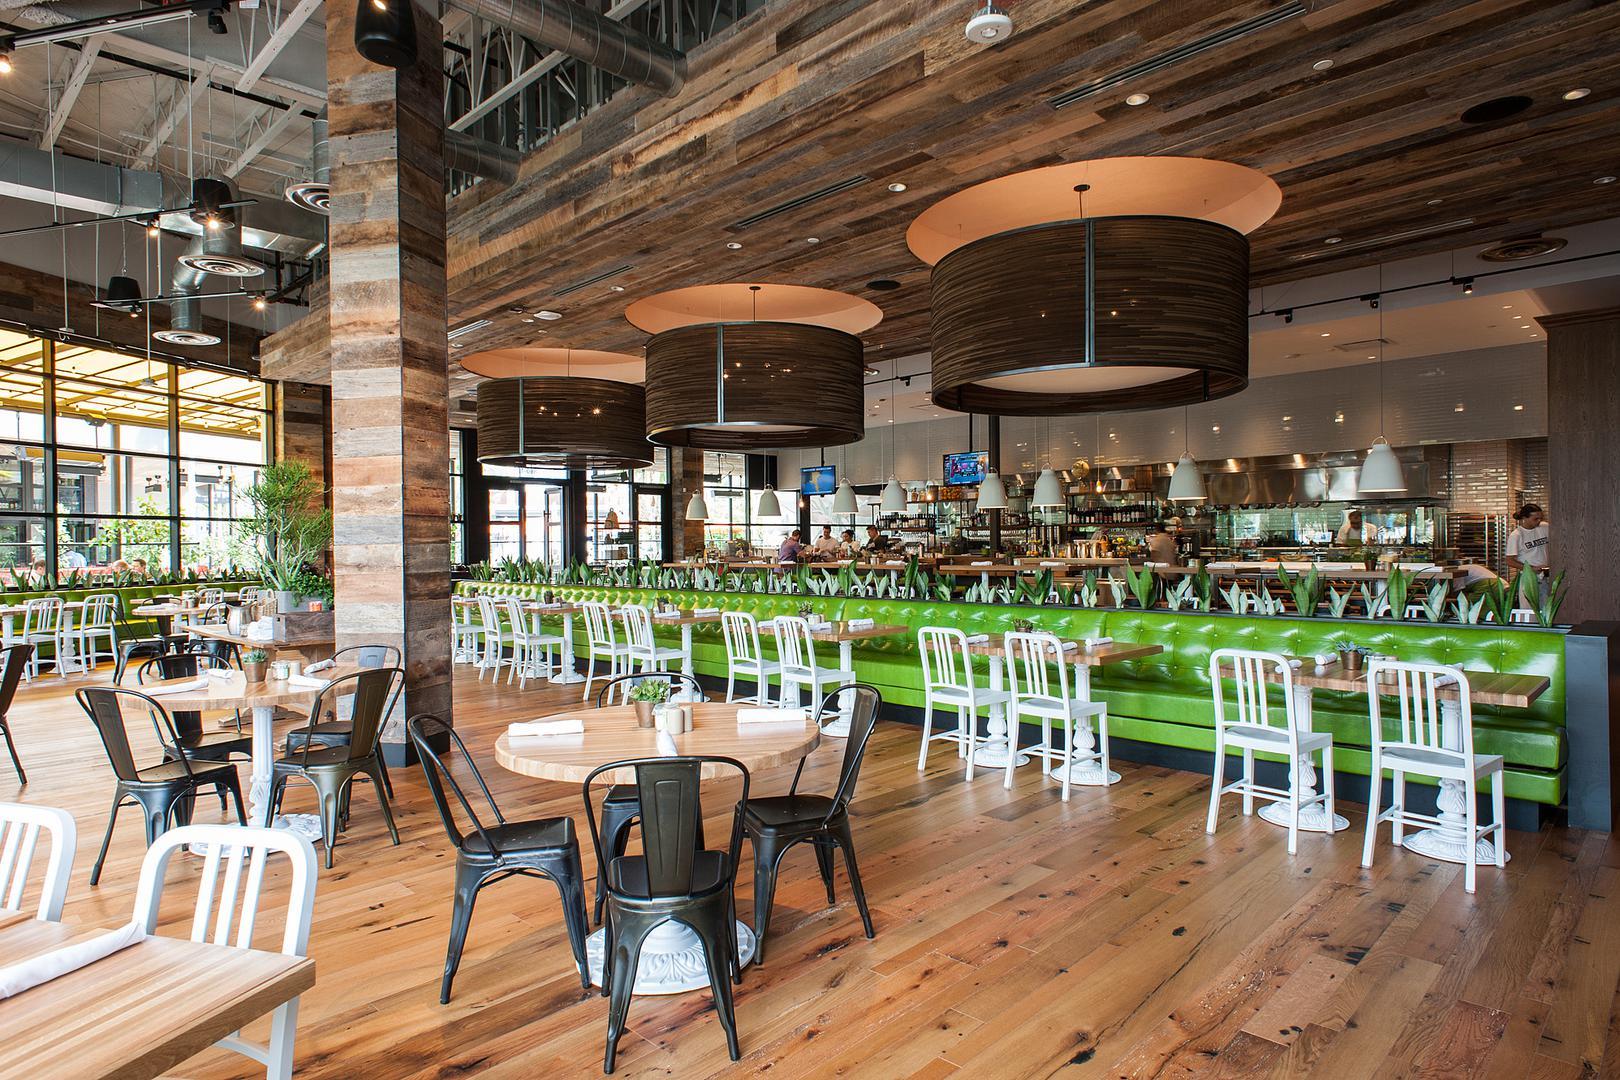 True Food Kitchen - El Segundo   Corporate Events, Wedding Locations, Event Spaces and Party Venues.